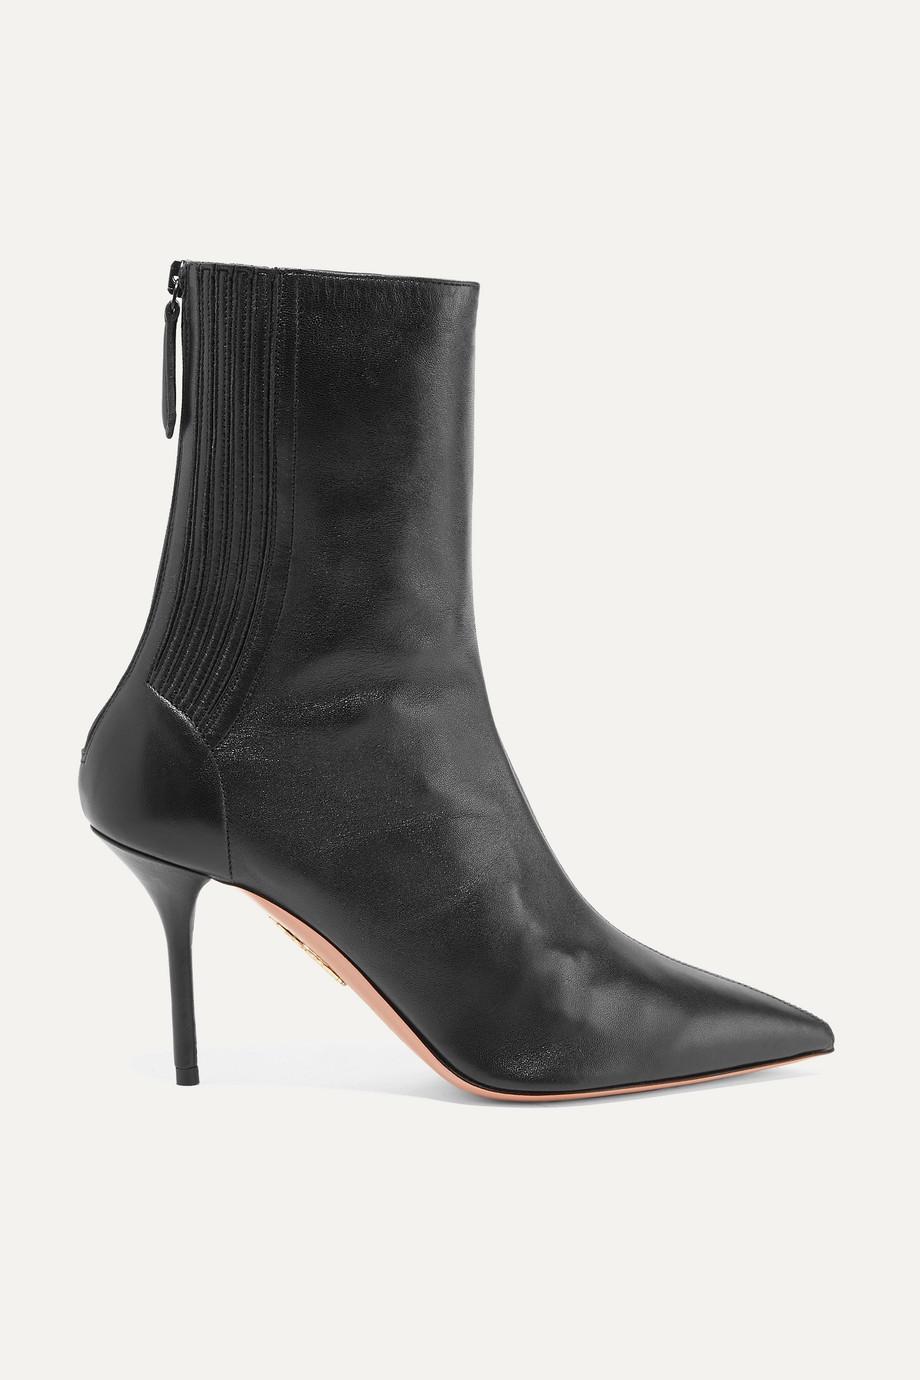 Aquazzura Saint Honoré 85 leather sock boots